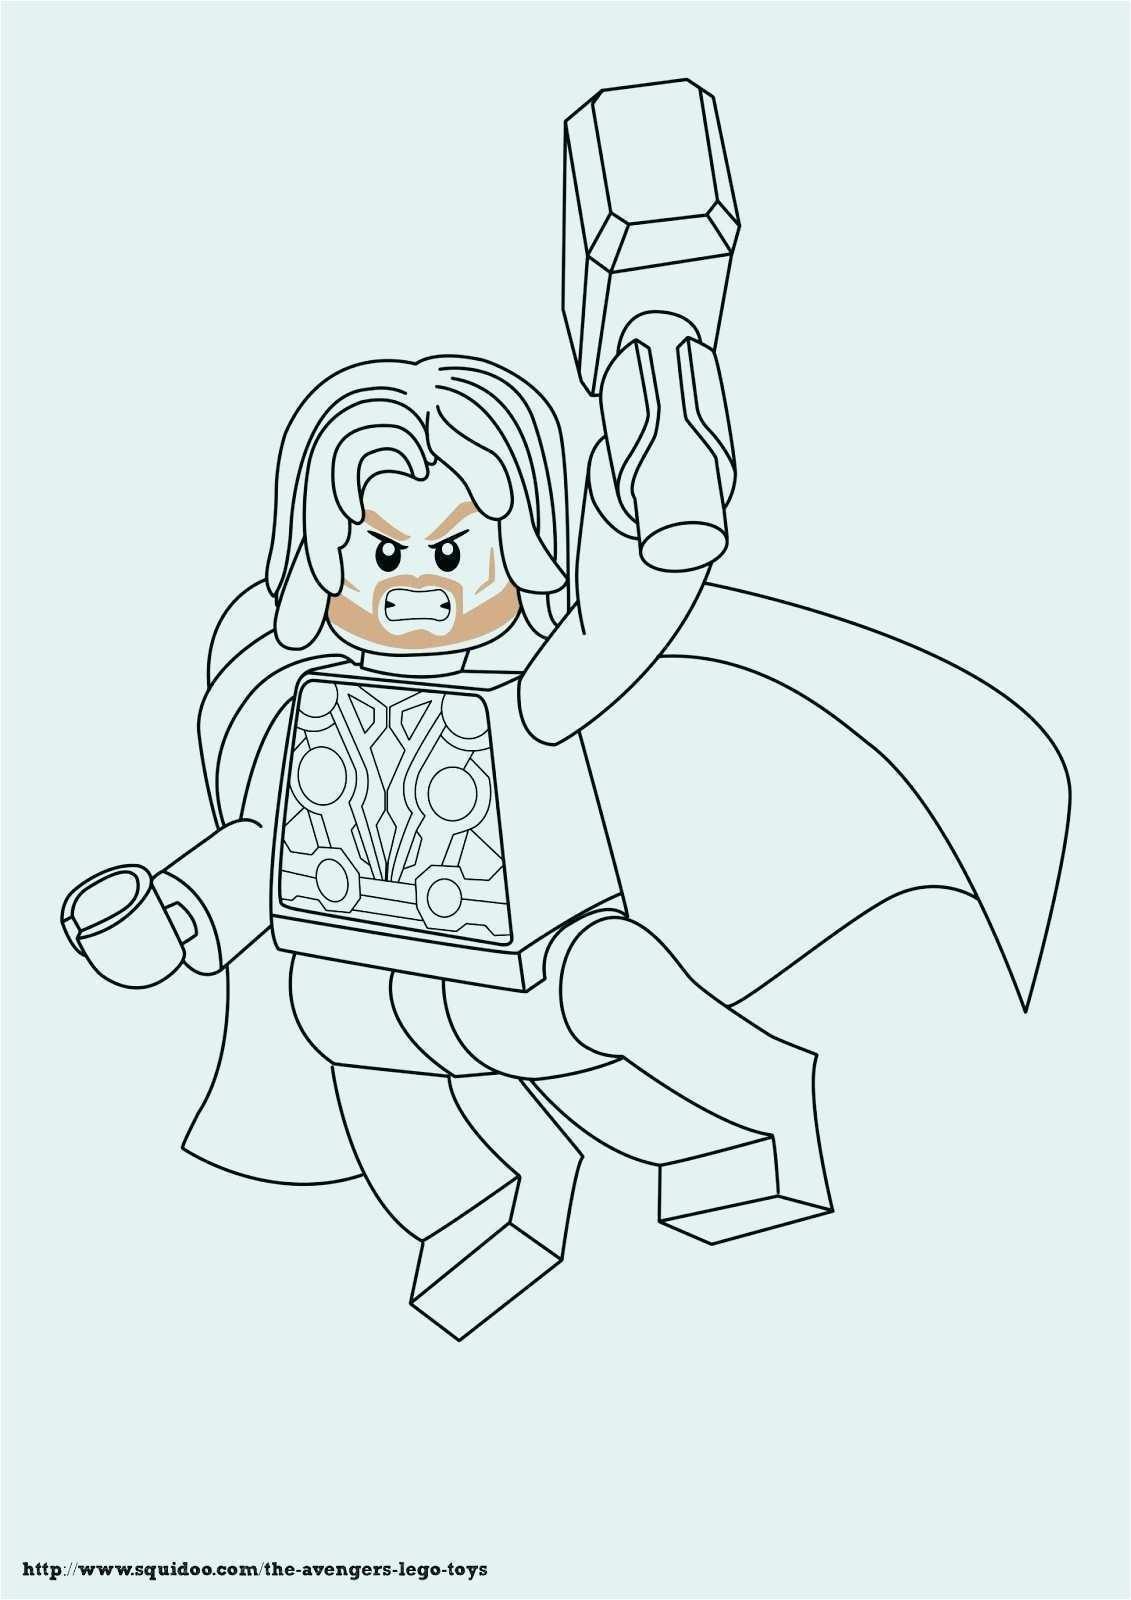 Ausmalbild Ninjago Lloyd Genial 46 Nouveau Dessin Lego Ninjago Lloyd Coloriage Kids Bild